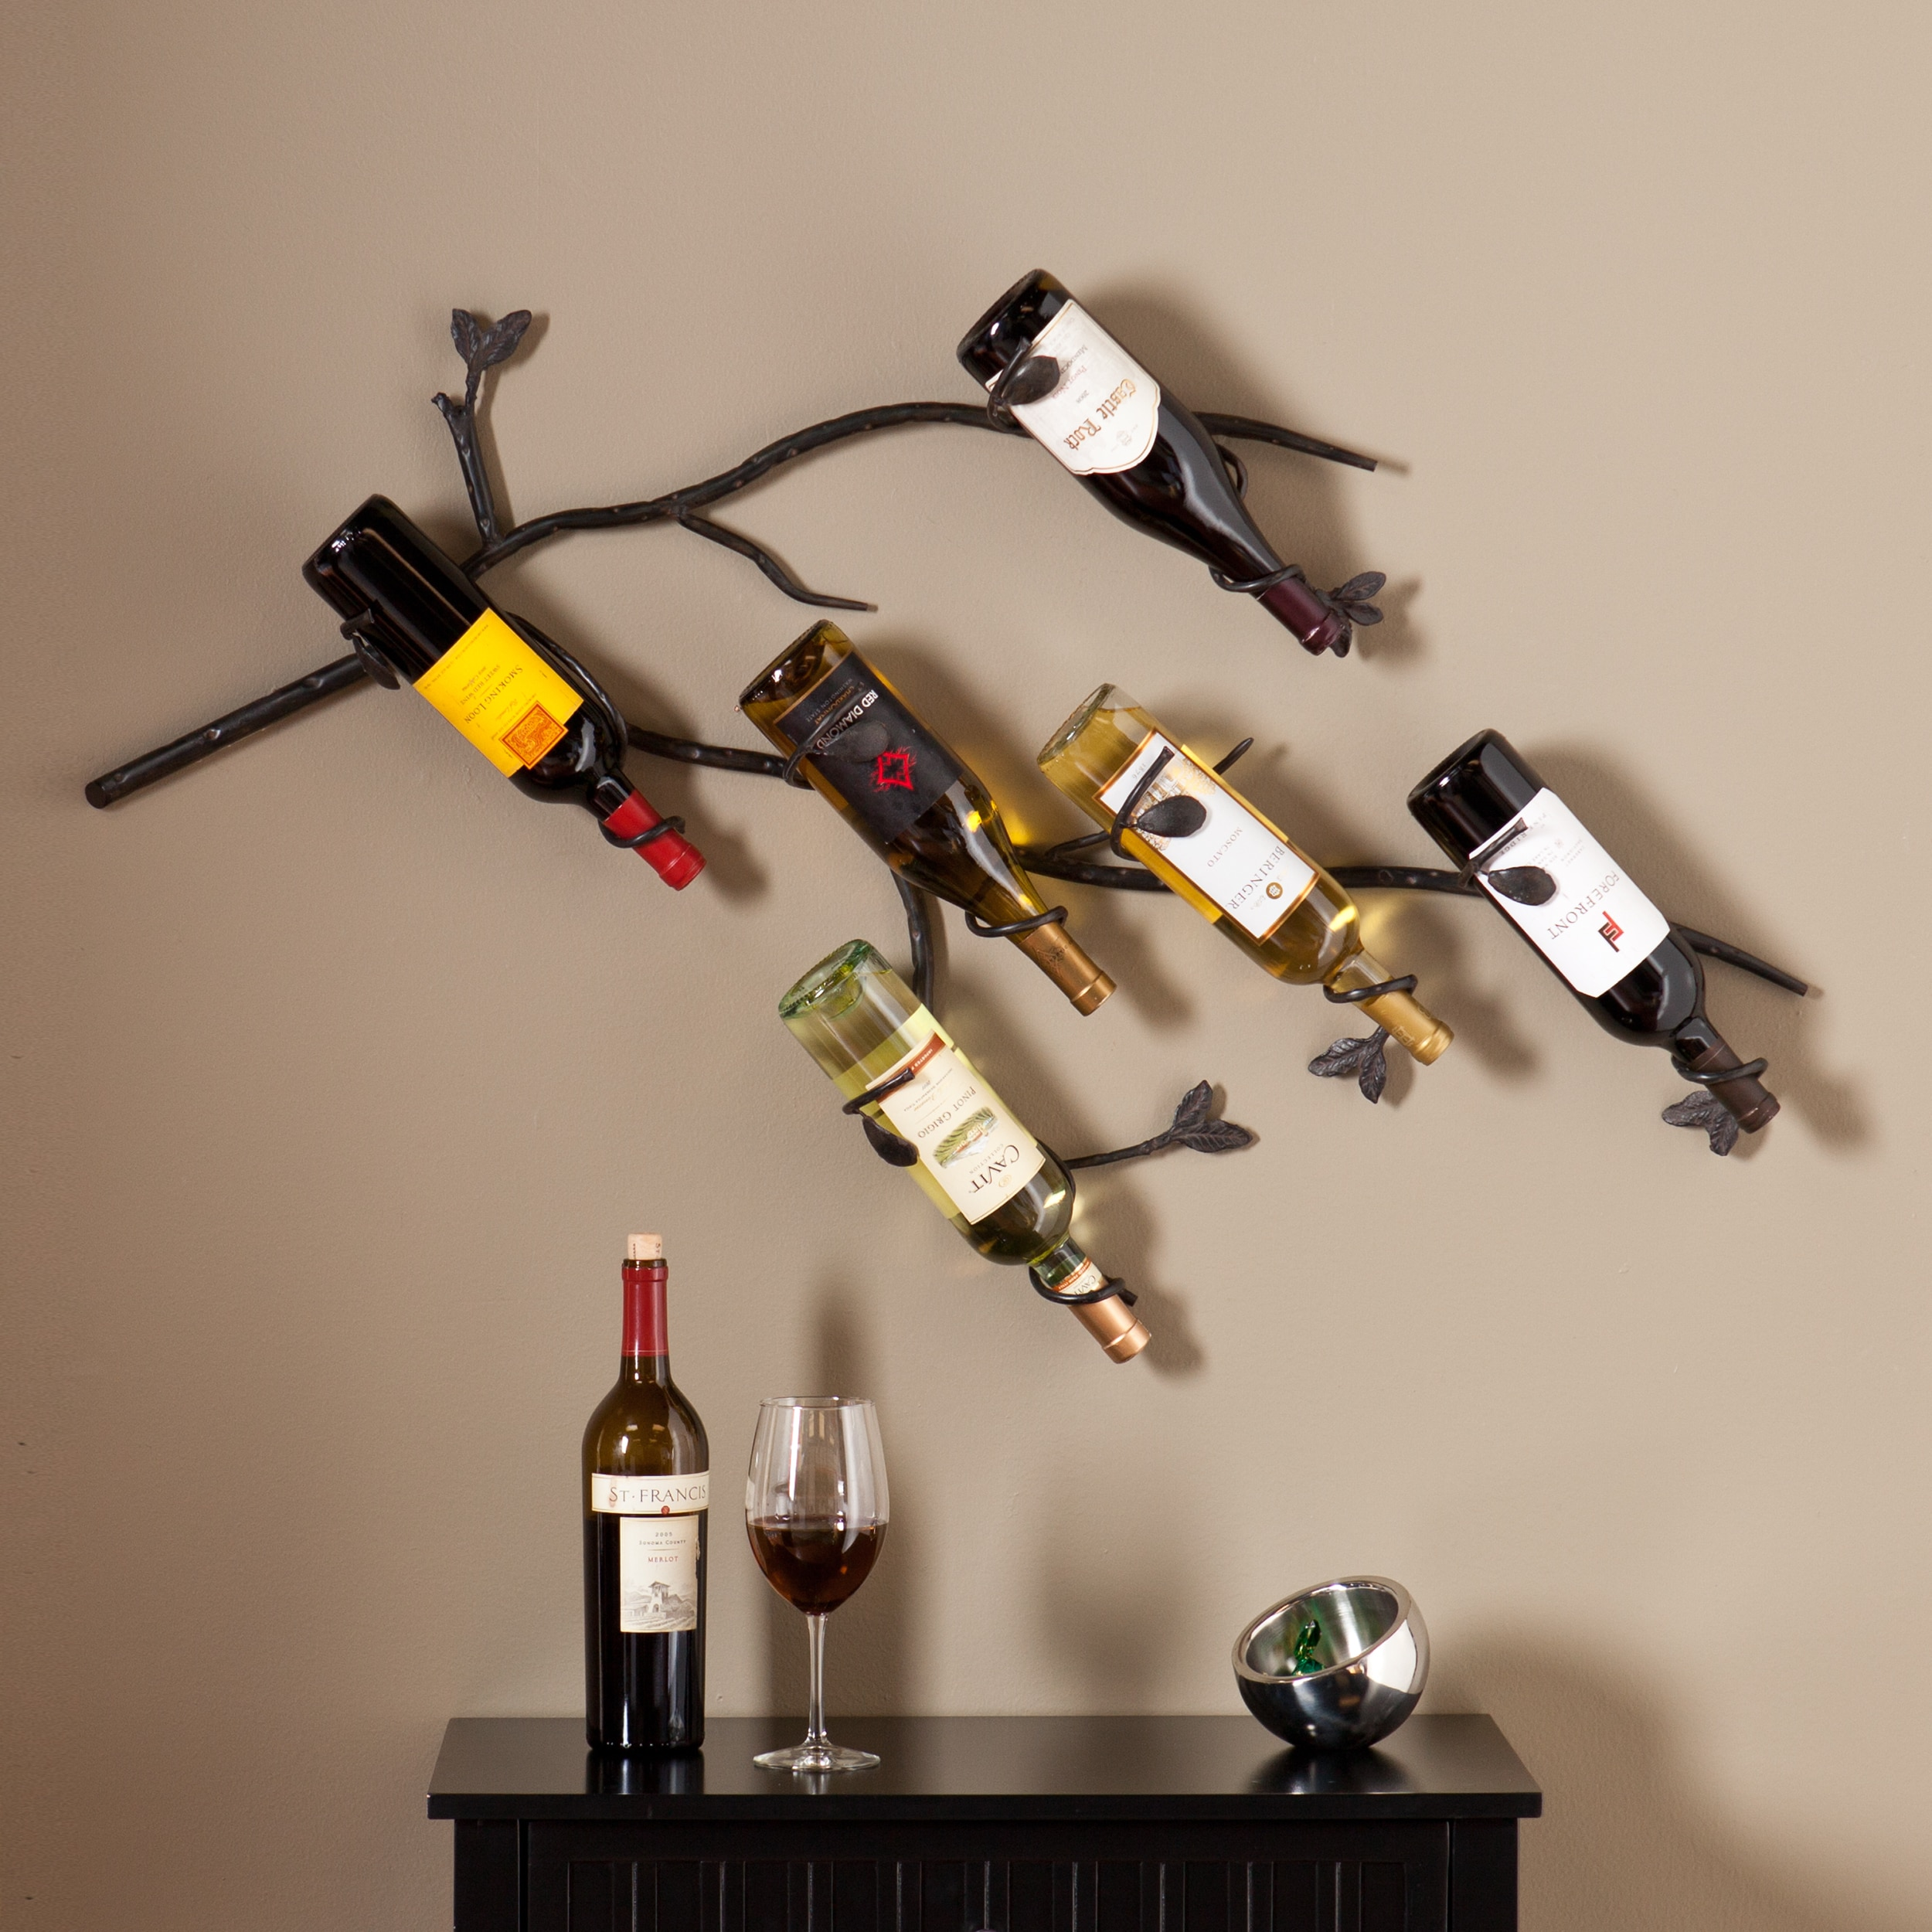 Harper Blvd Keaton Wall Mount Wine Rack - Free Shipping Today -  Overstock.com - 16412281